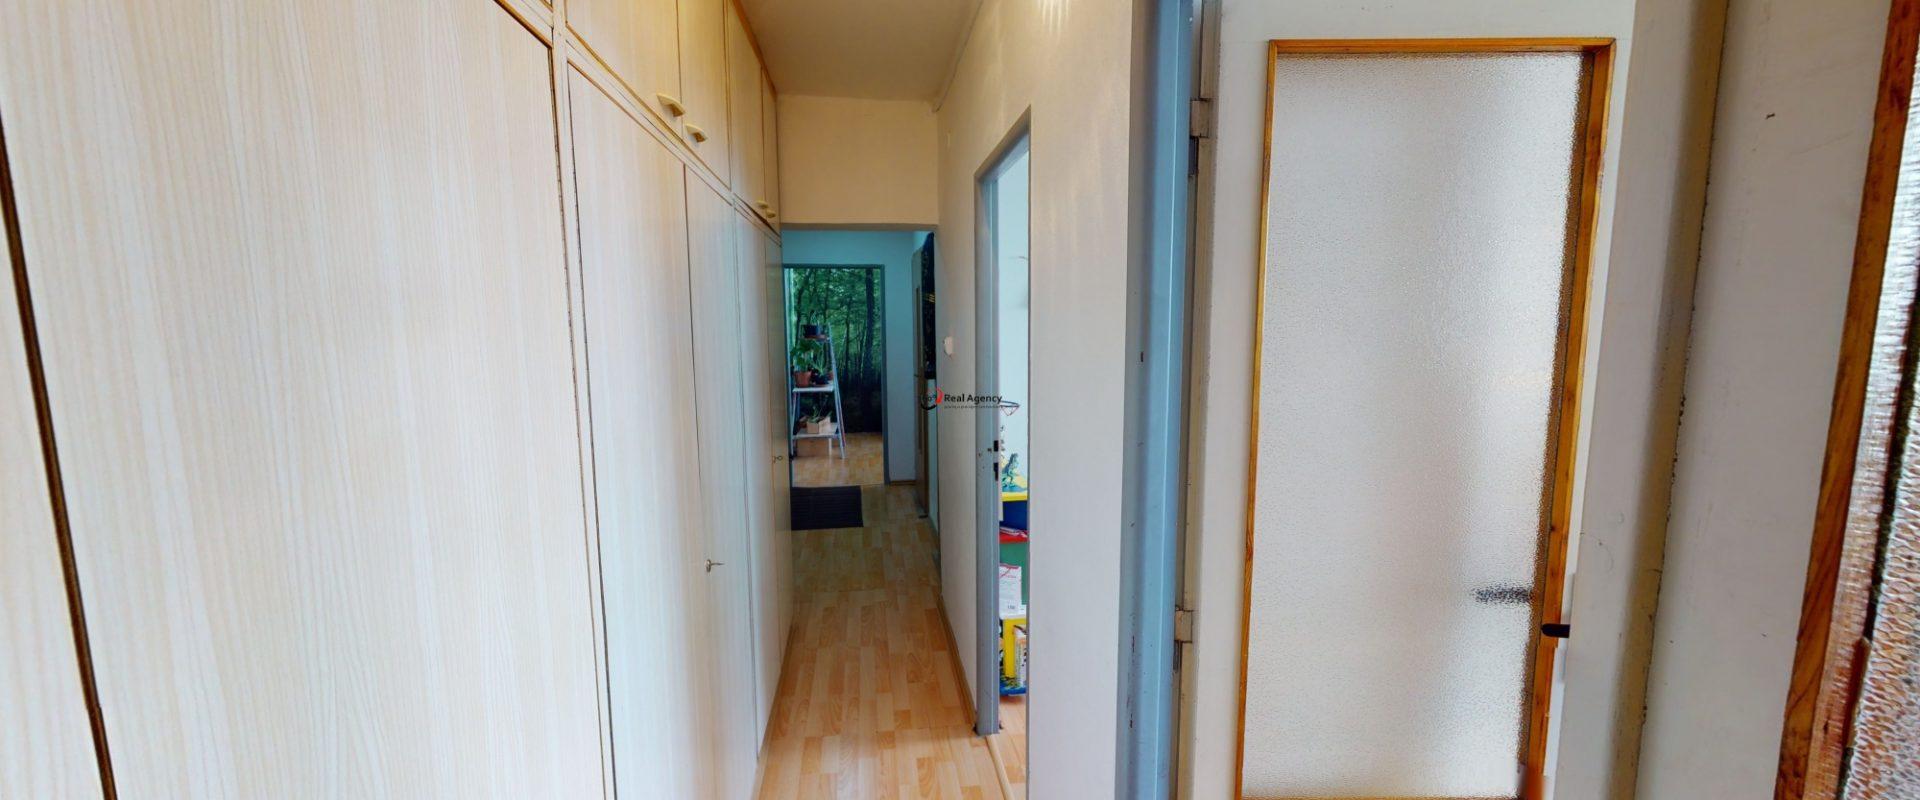 Prodej bytu 3+1/L/sklep 64 m², Praha 10 Strašnice.